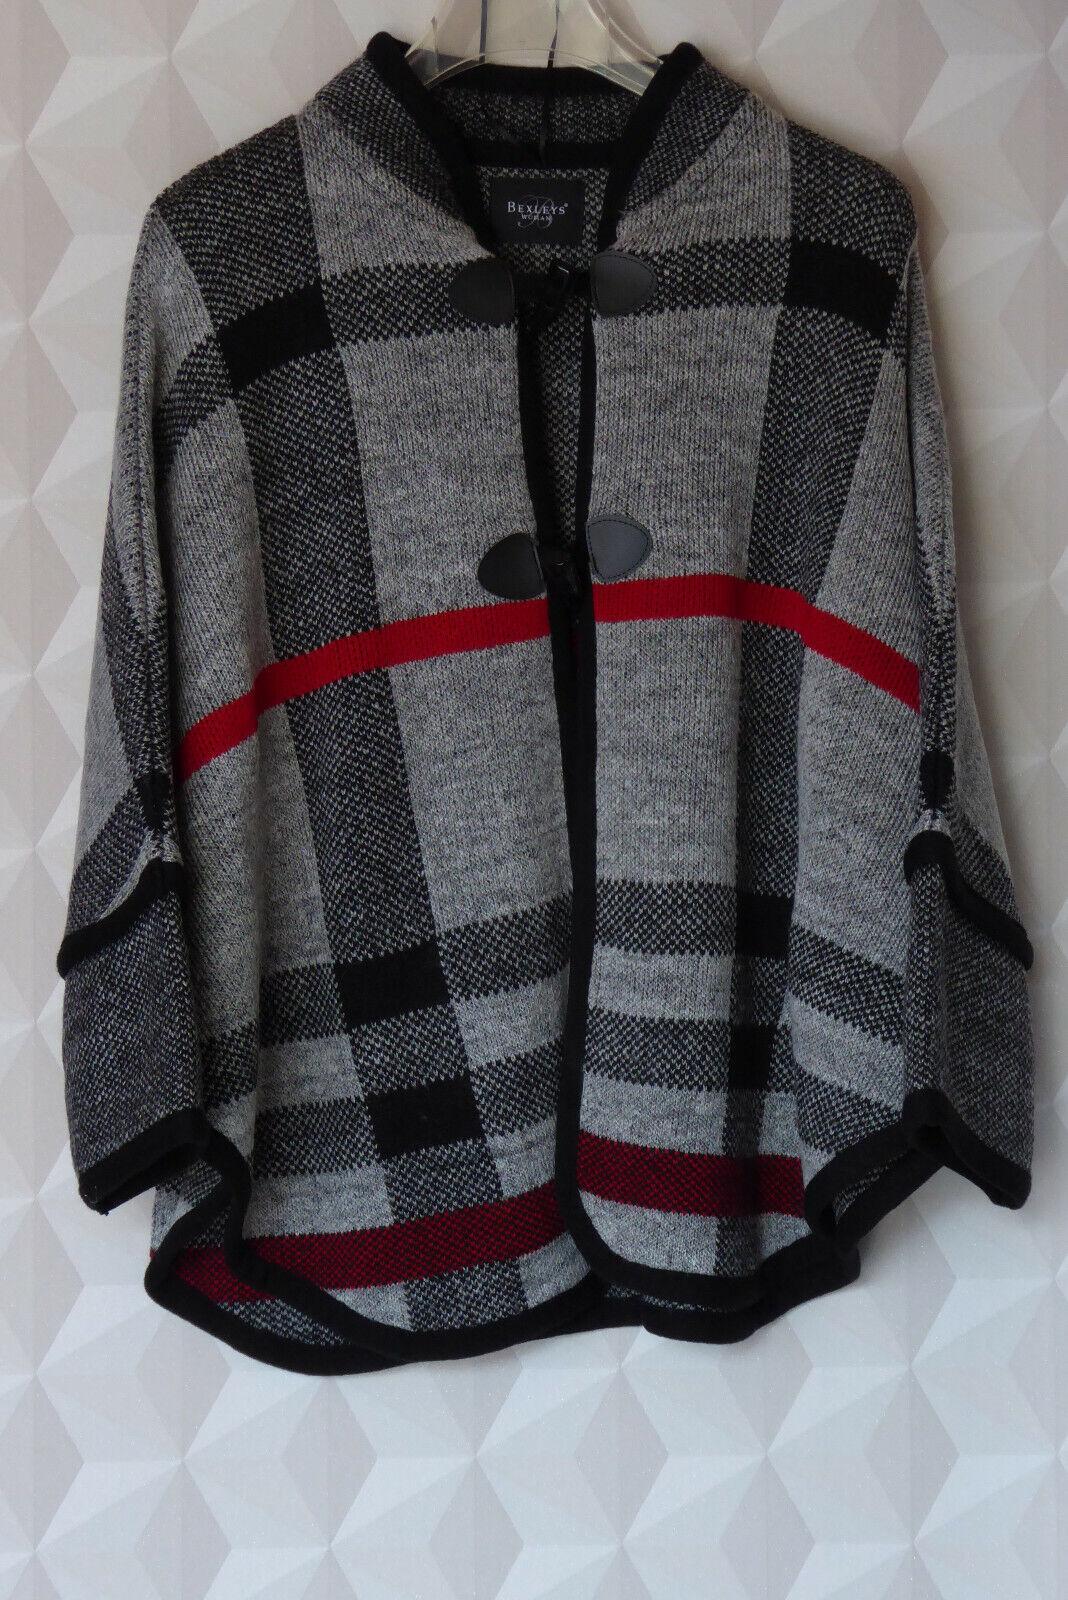 schicke Damen Poncho Strick Jacke, weiß - schwarz - rot, Adler - Bexleys, Gr. XL